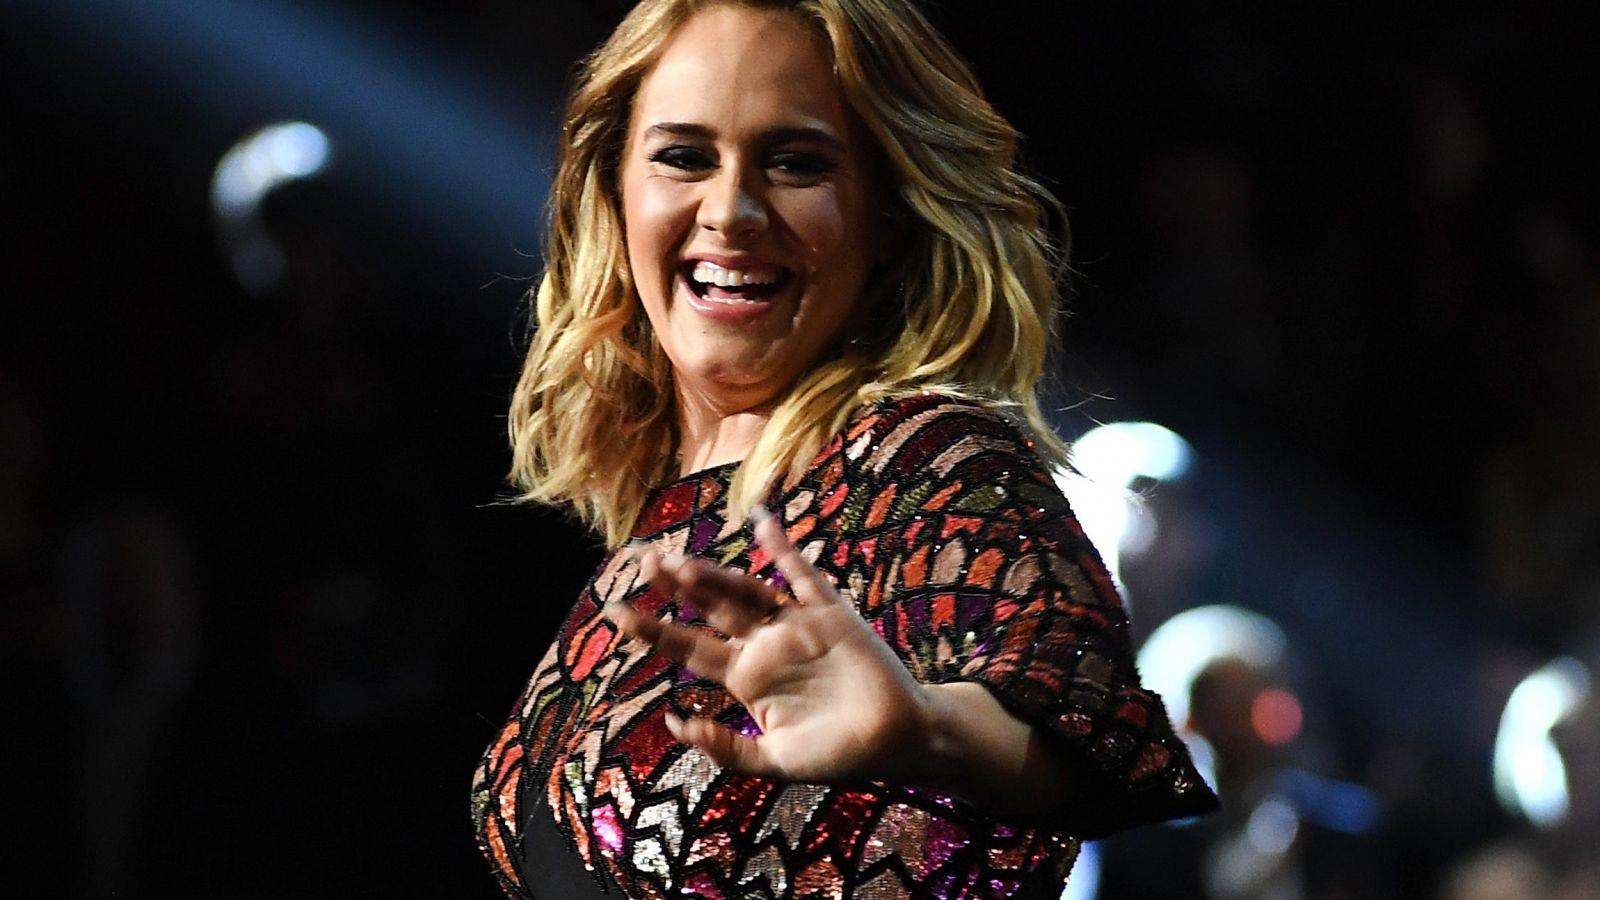 Adele: Δείτε την εντυπωσιακή της εμφάνιση στο trailer της νέας της εκπομπής [vid]